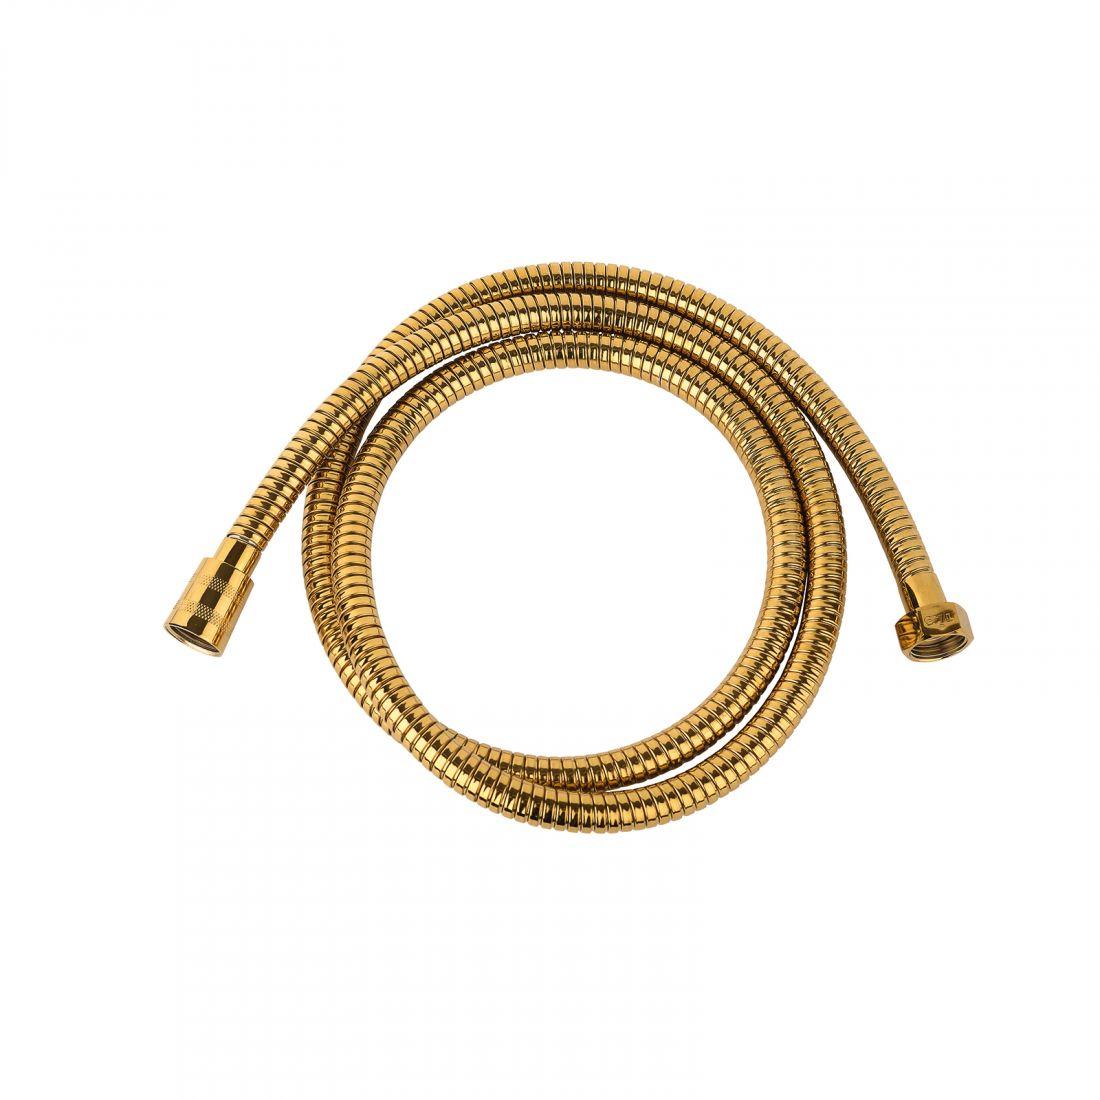 Шланг для душа Timo 1,5mm (SH100 gold)